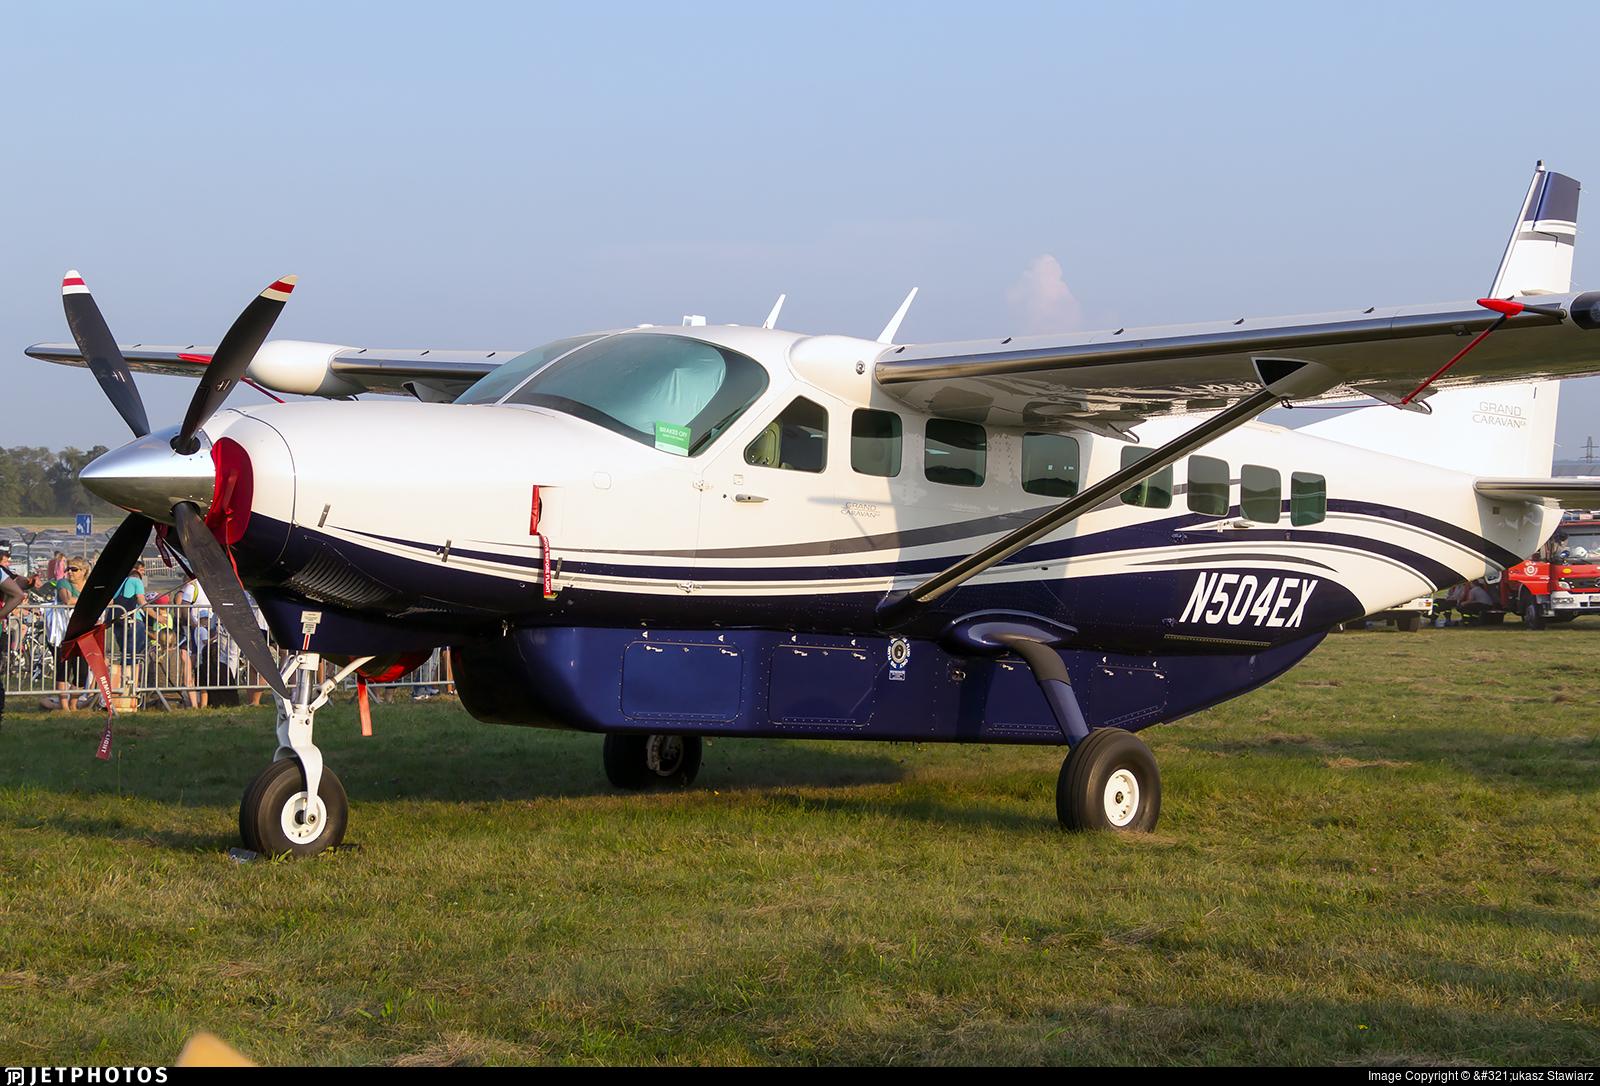 N504ex Cessna 208b Grand Caravan Ex Textron Aviation Lukasz Stawiarz Jetphotos